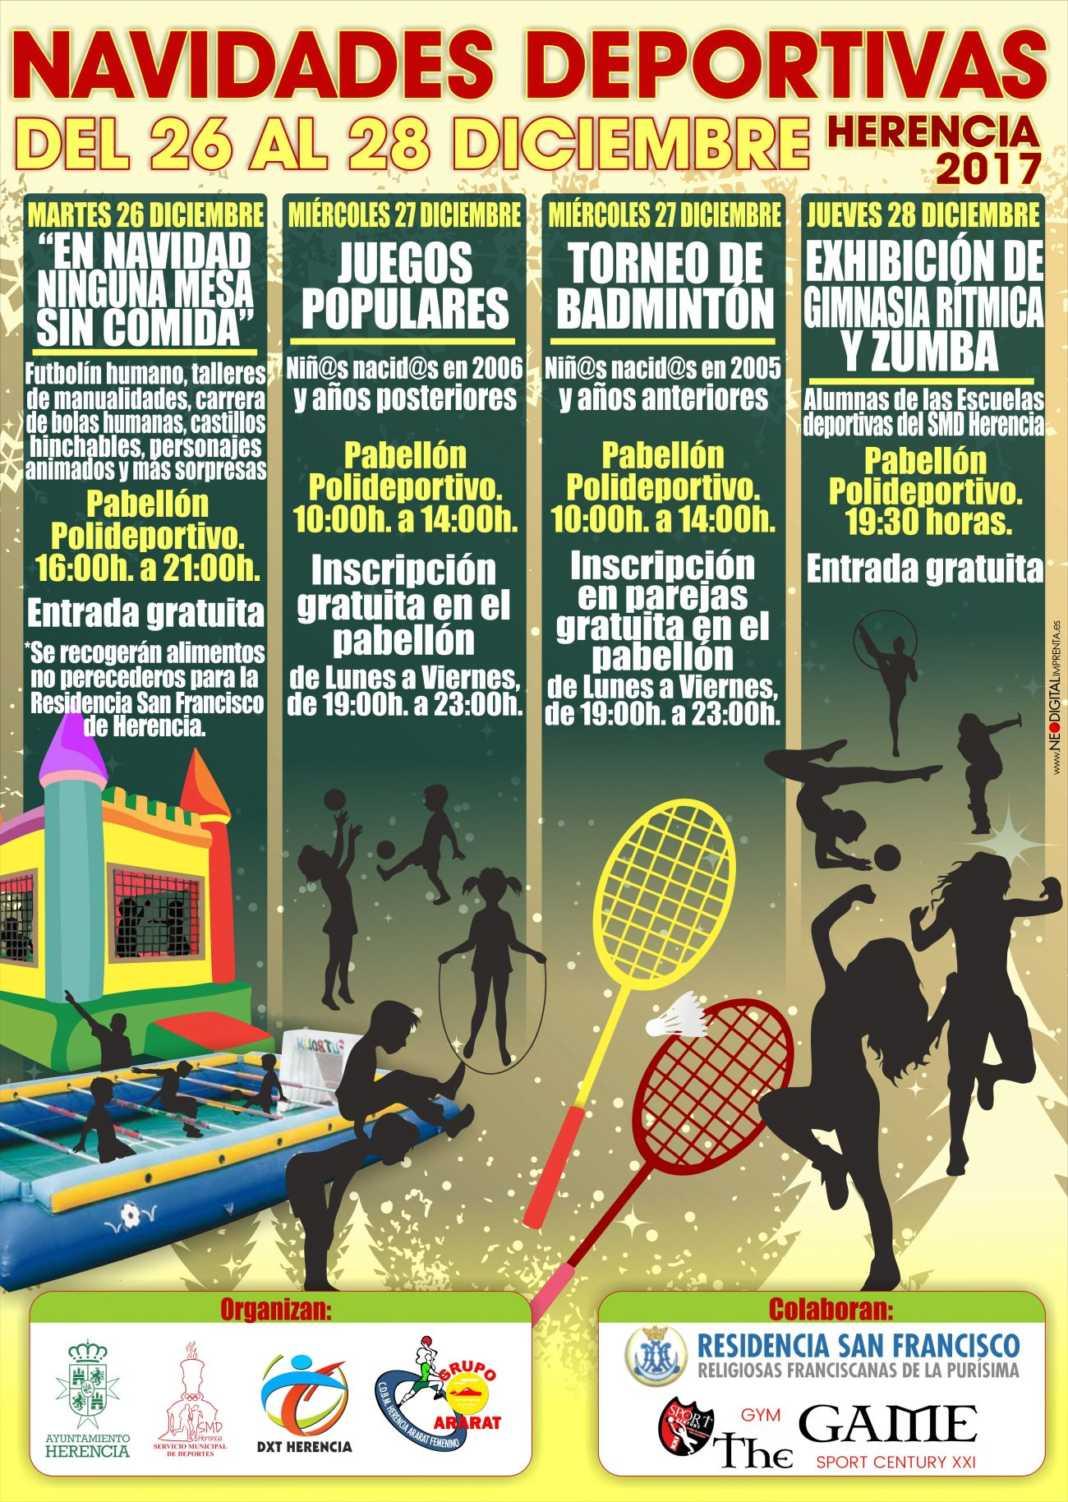 navidades deportivas herencia 2017 1068x1502 - Navidades deportivas en Herencia